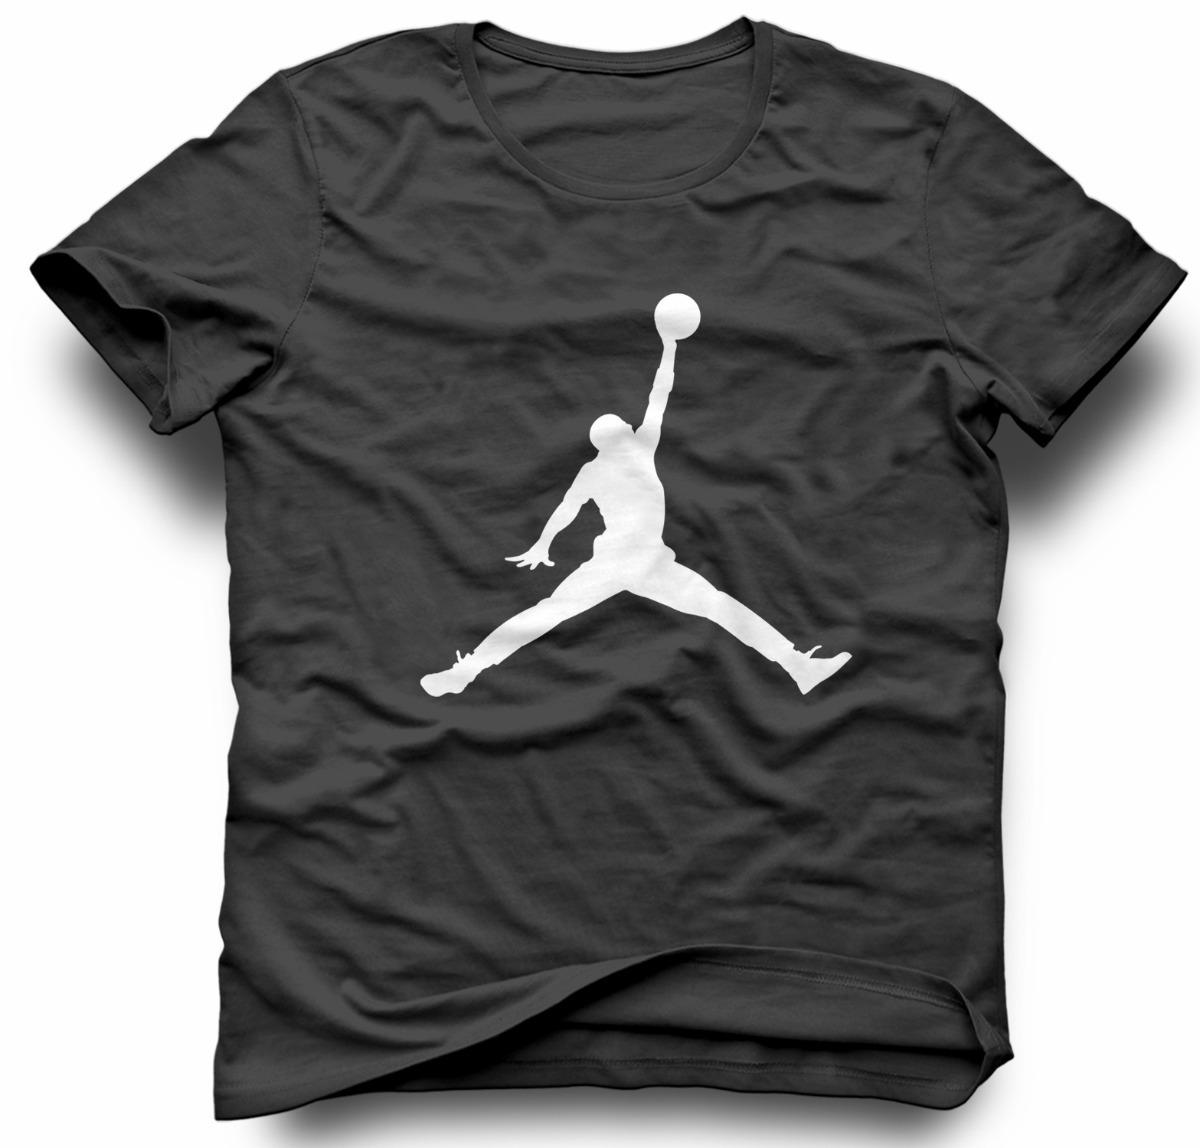 757ae3aa630 Camiseta Camisa Jordan Air Basketball Basquete 100% Algodão - R  39 ...